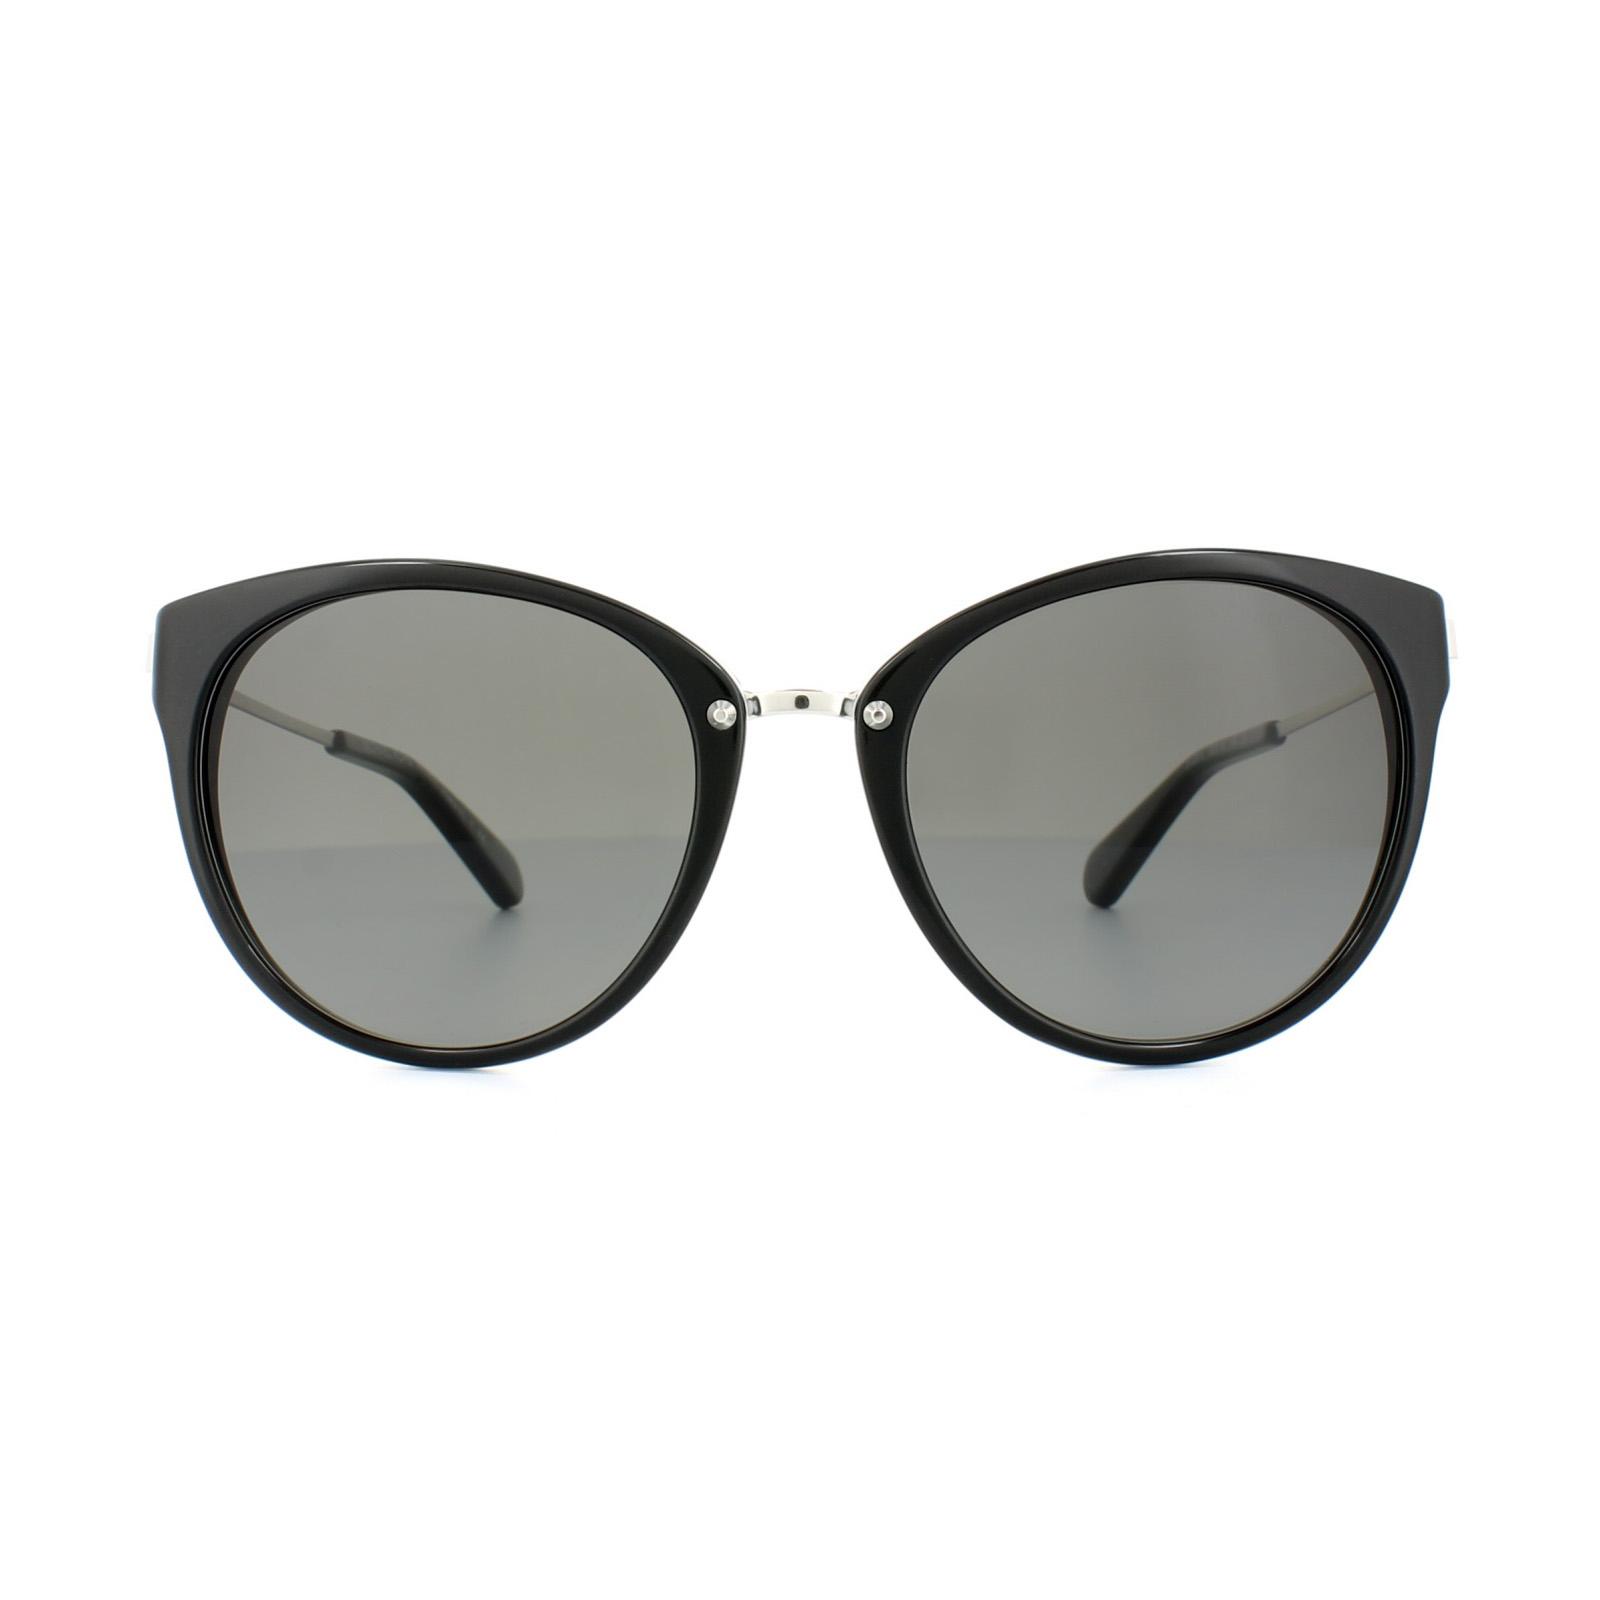 4563948c39 Sentinel Michael Kors Sunglasses Abela III 6040 3129 11 Black White Grey  Gradient